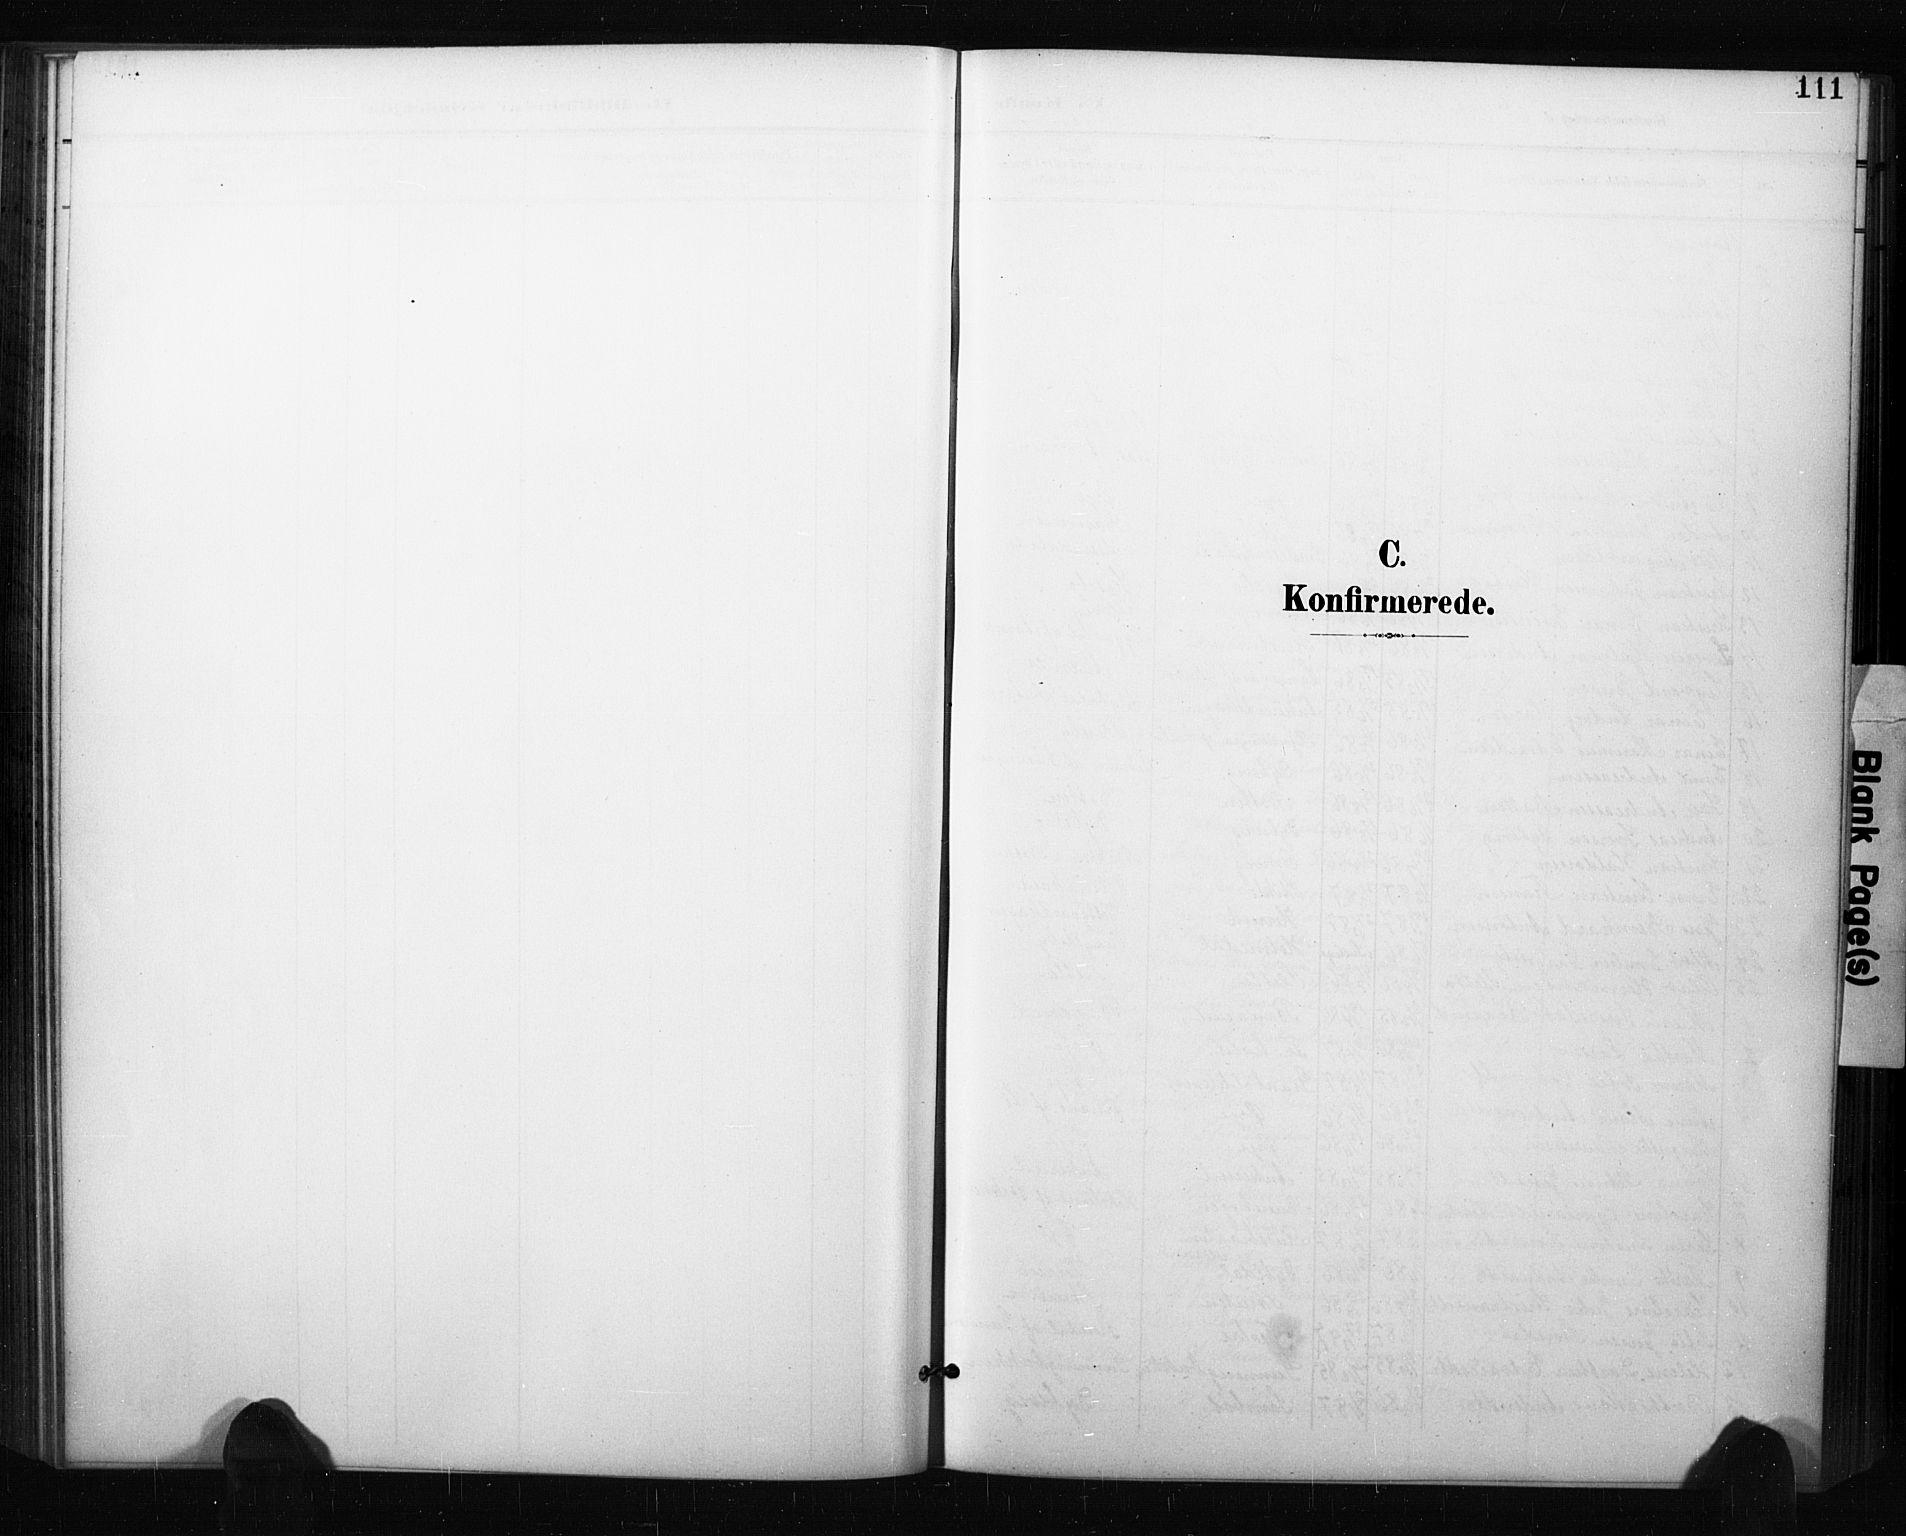 SAO, Aremark prestekontor Kirkebøker, G/Gb/L0001: Klokkerbok nr. II 1, 1901-1927, s. 111